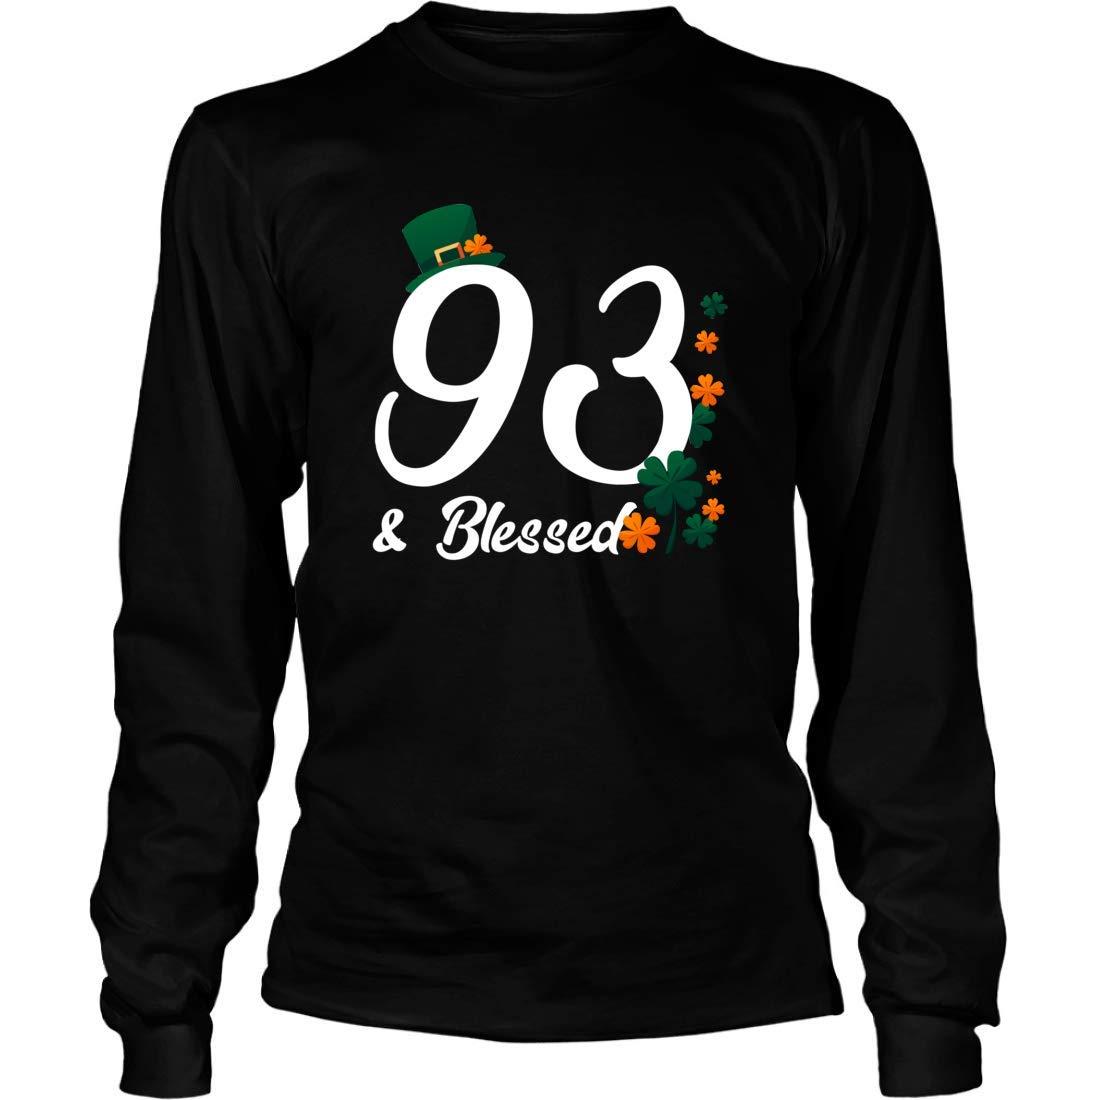 Shirts Gifts for 93rd Birthday Irish Mishozi 93rd and Blessed Ireland Long Sleeve T-Shirt Unisex